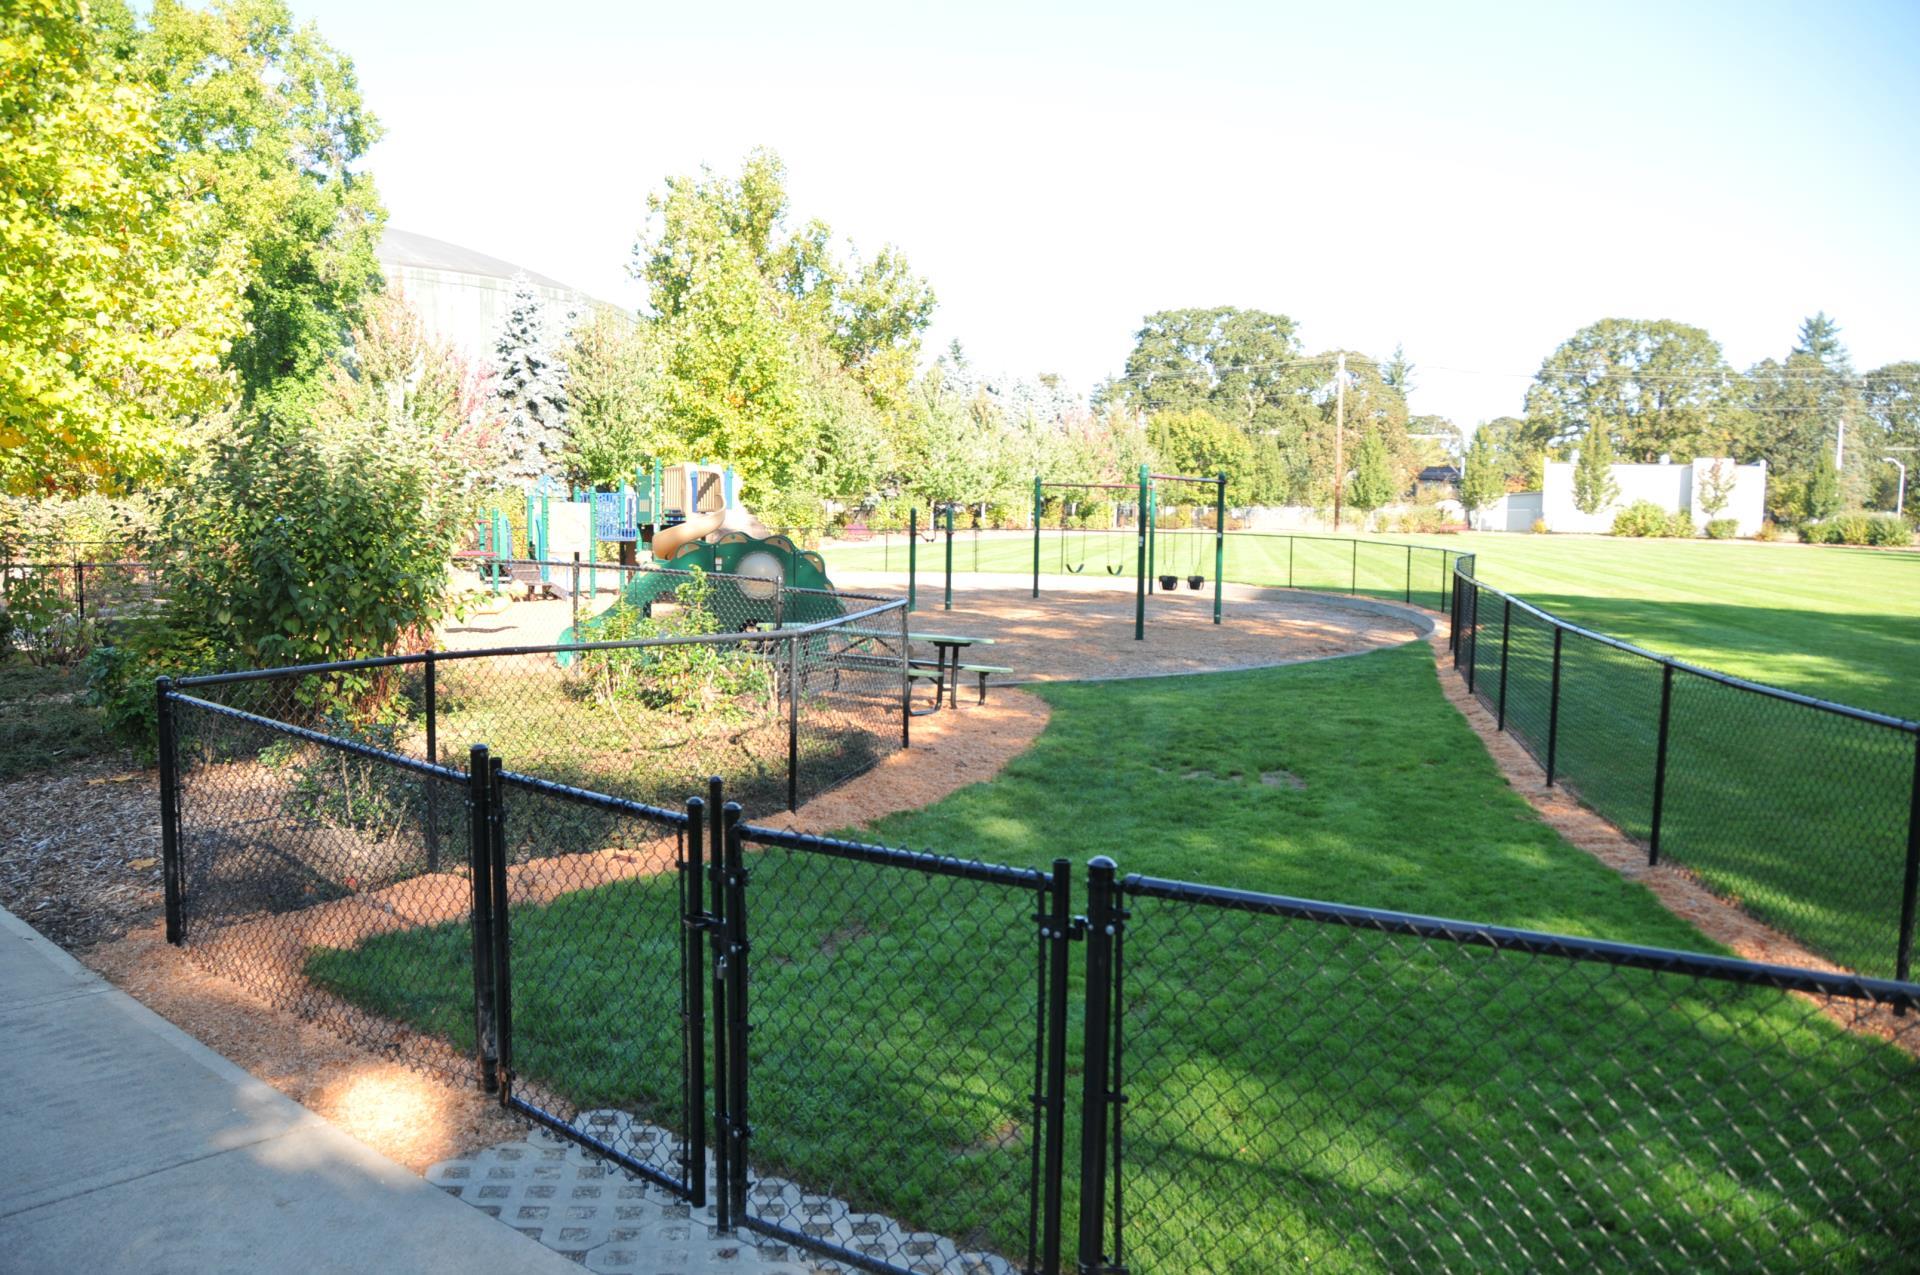 Bicentennial Park's fenced playground